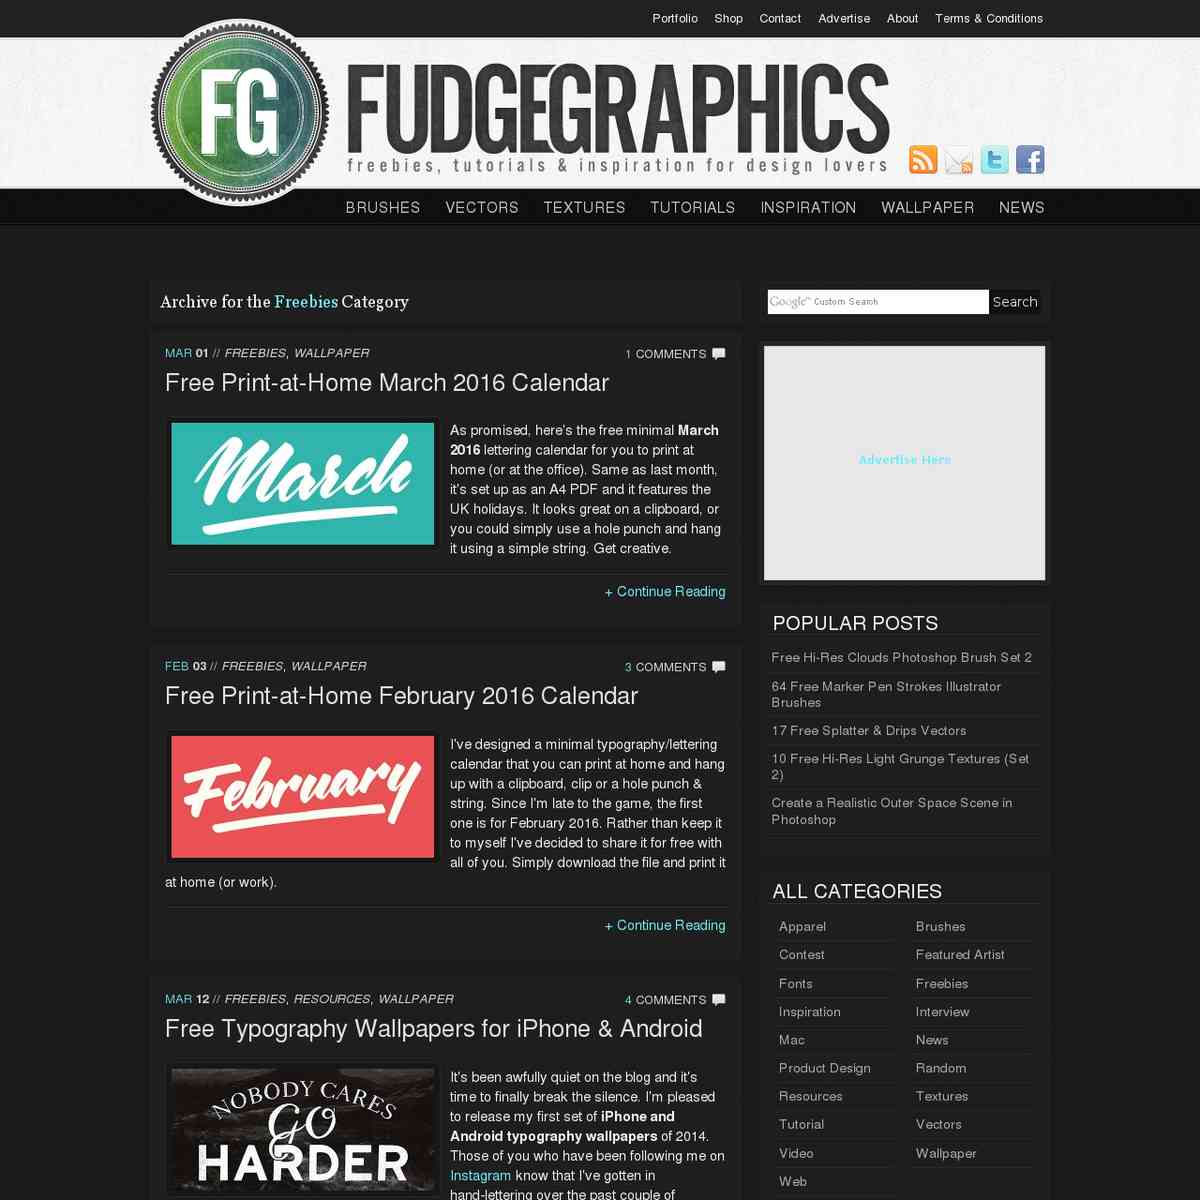 Freebies | Fudgegraphics | for lovers